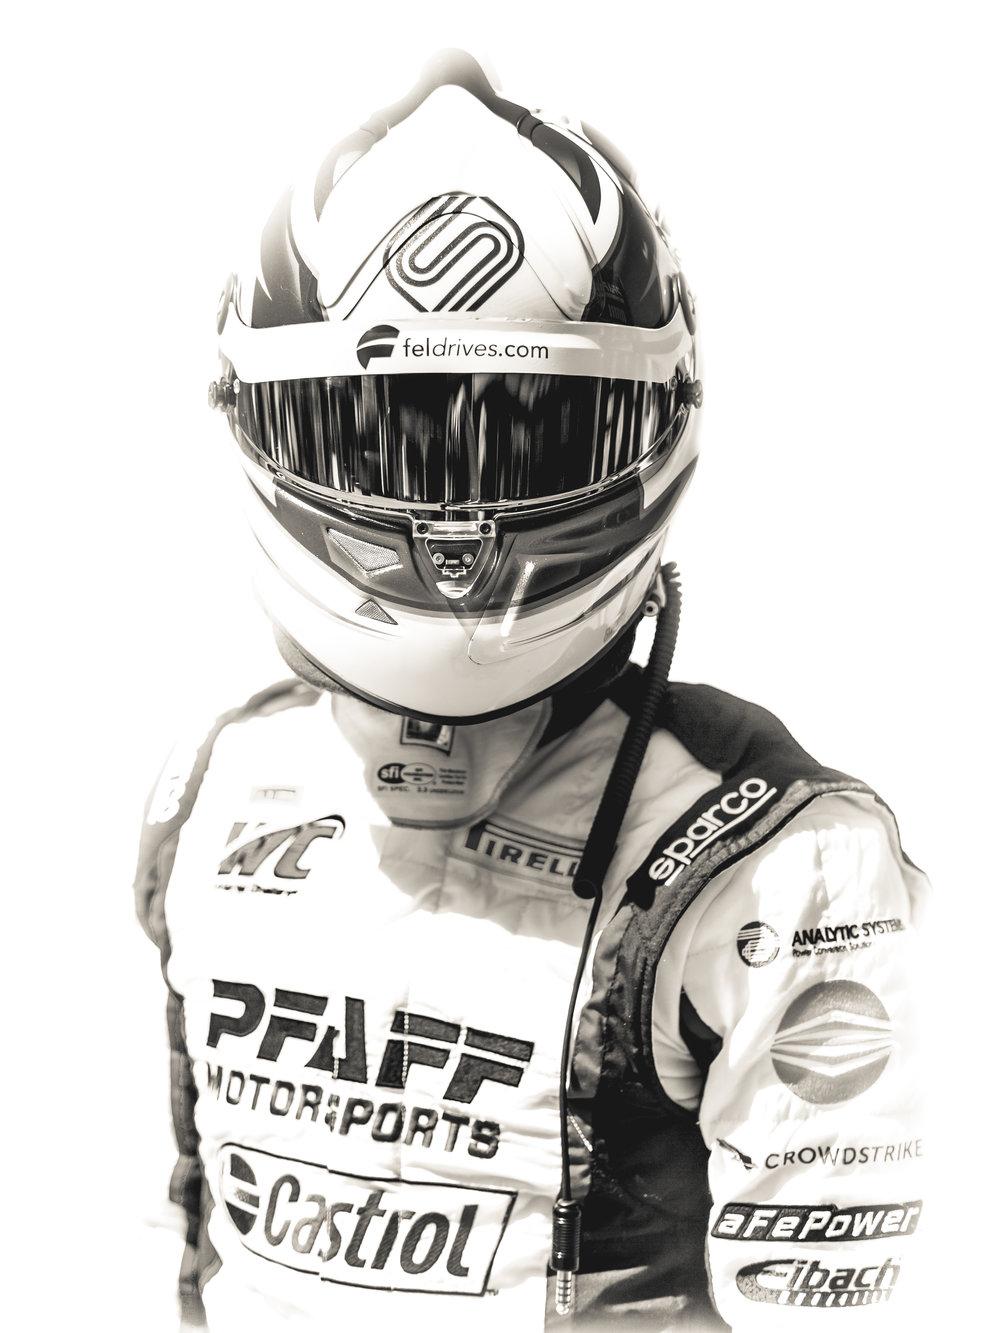 Pirelli World Challenge - Scott Hargrove - Pfaff Motorsports_© Lenssen Photo 2018-_L1_1710-Edit-2.jpg